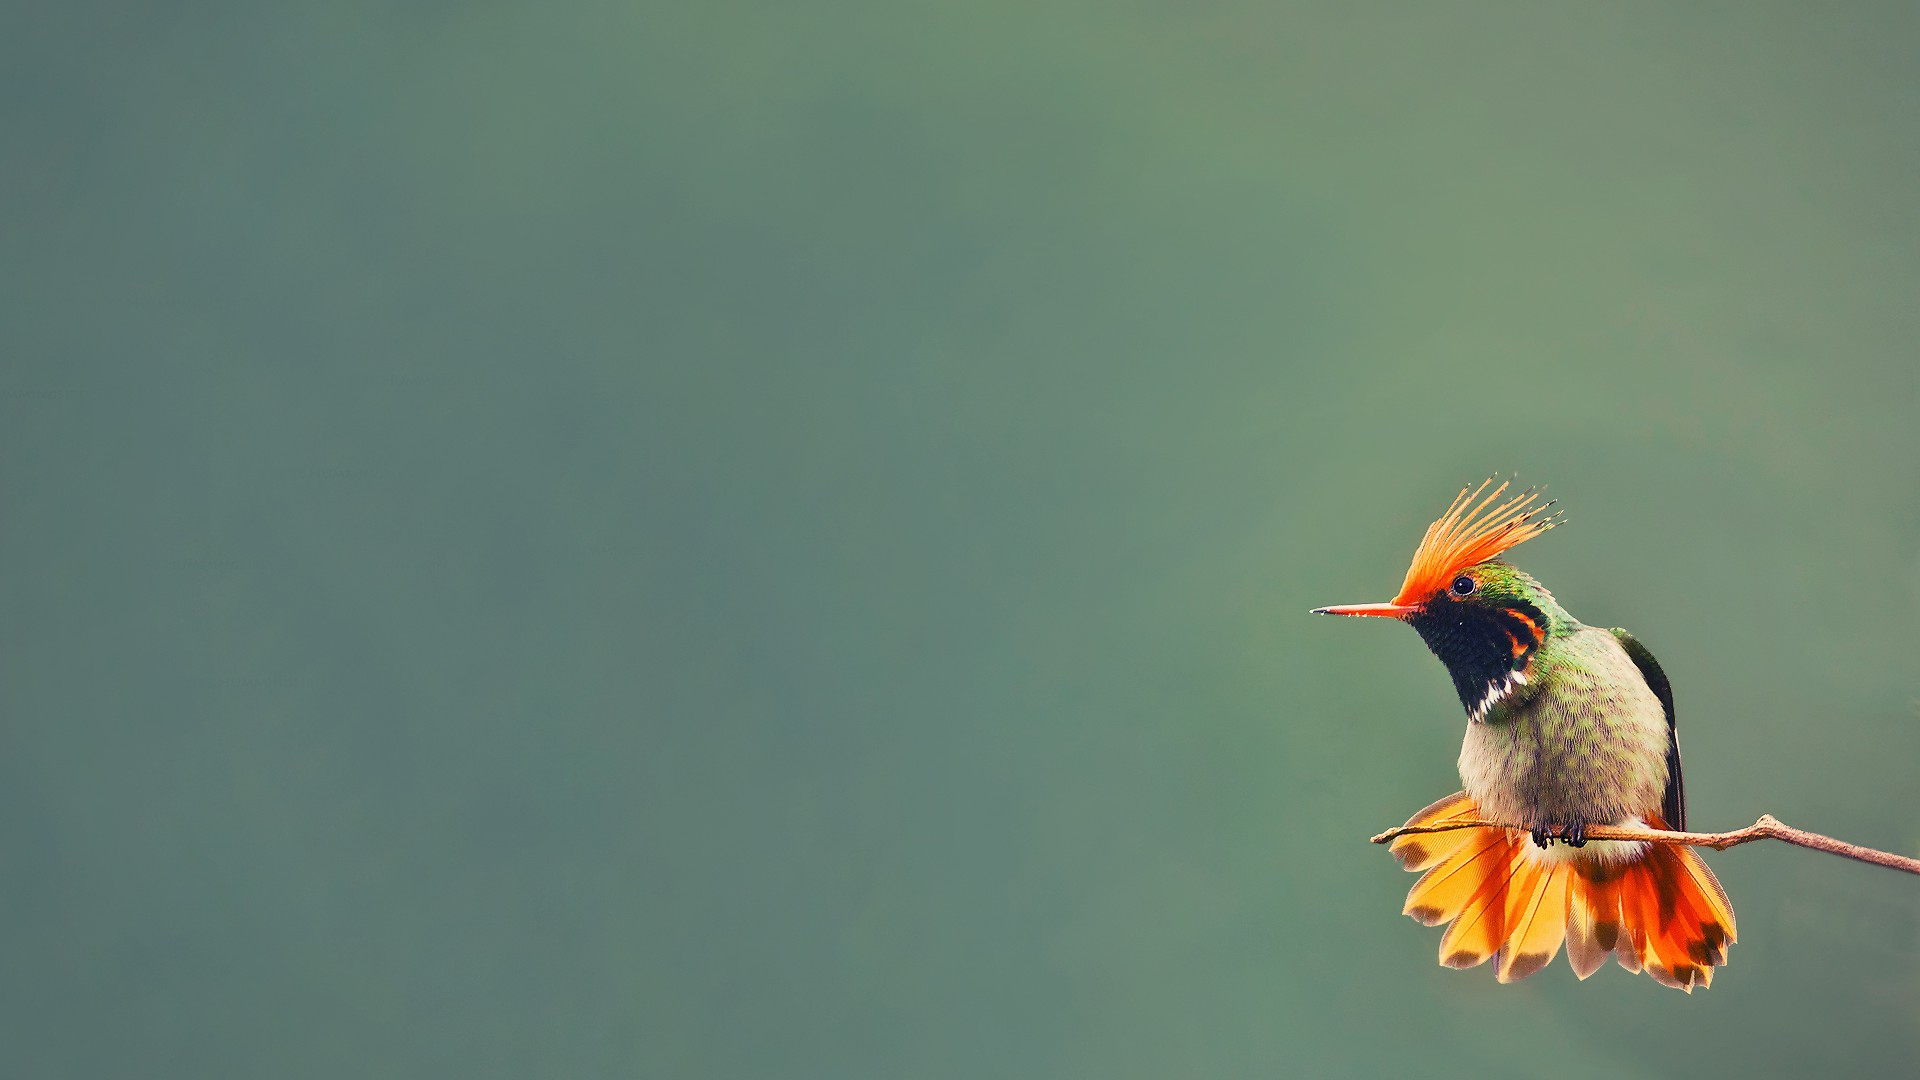 Colibri Fond Décran Hd